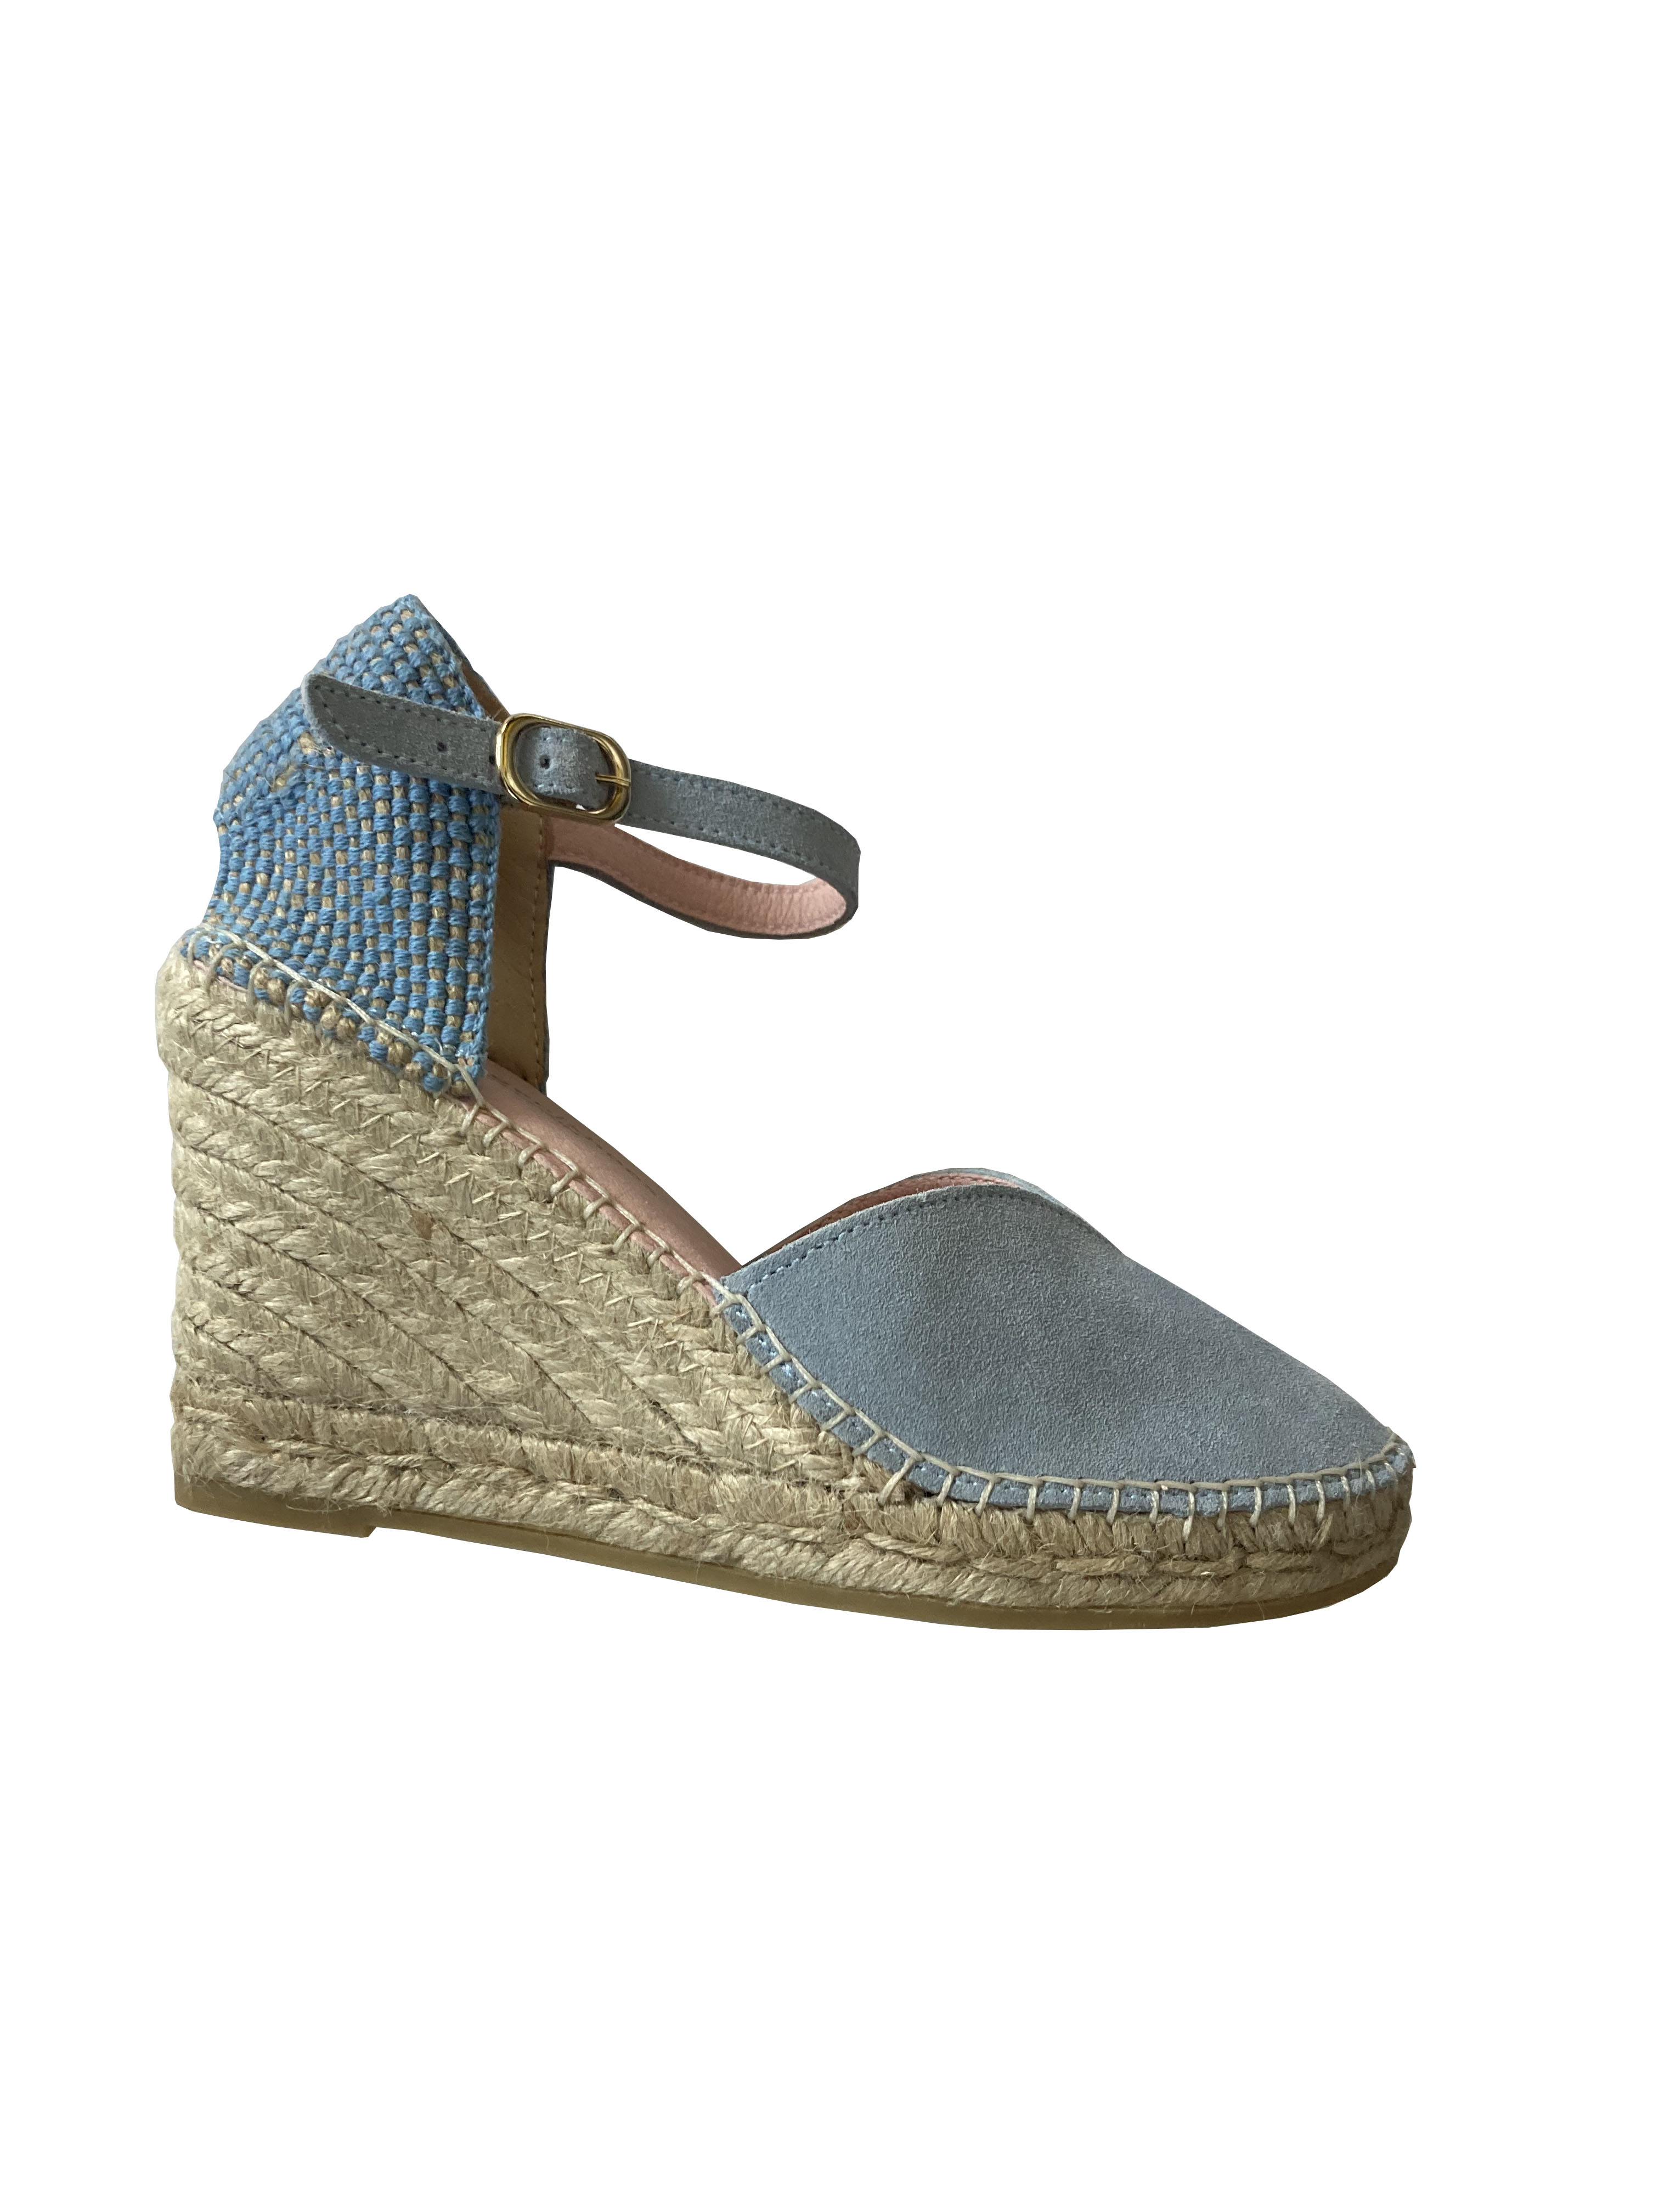 Copenhagen Shoes - Idania Baby Blue